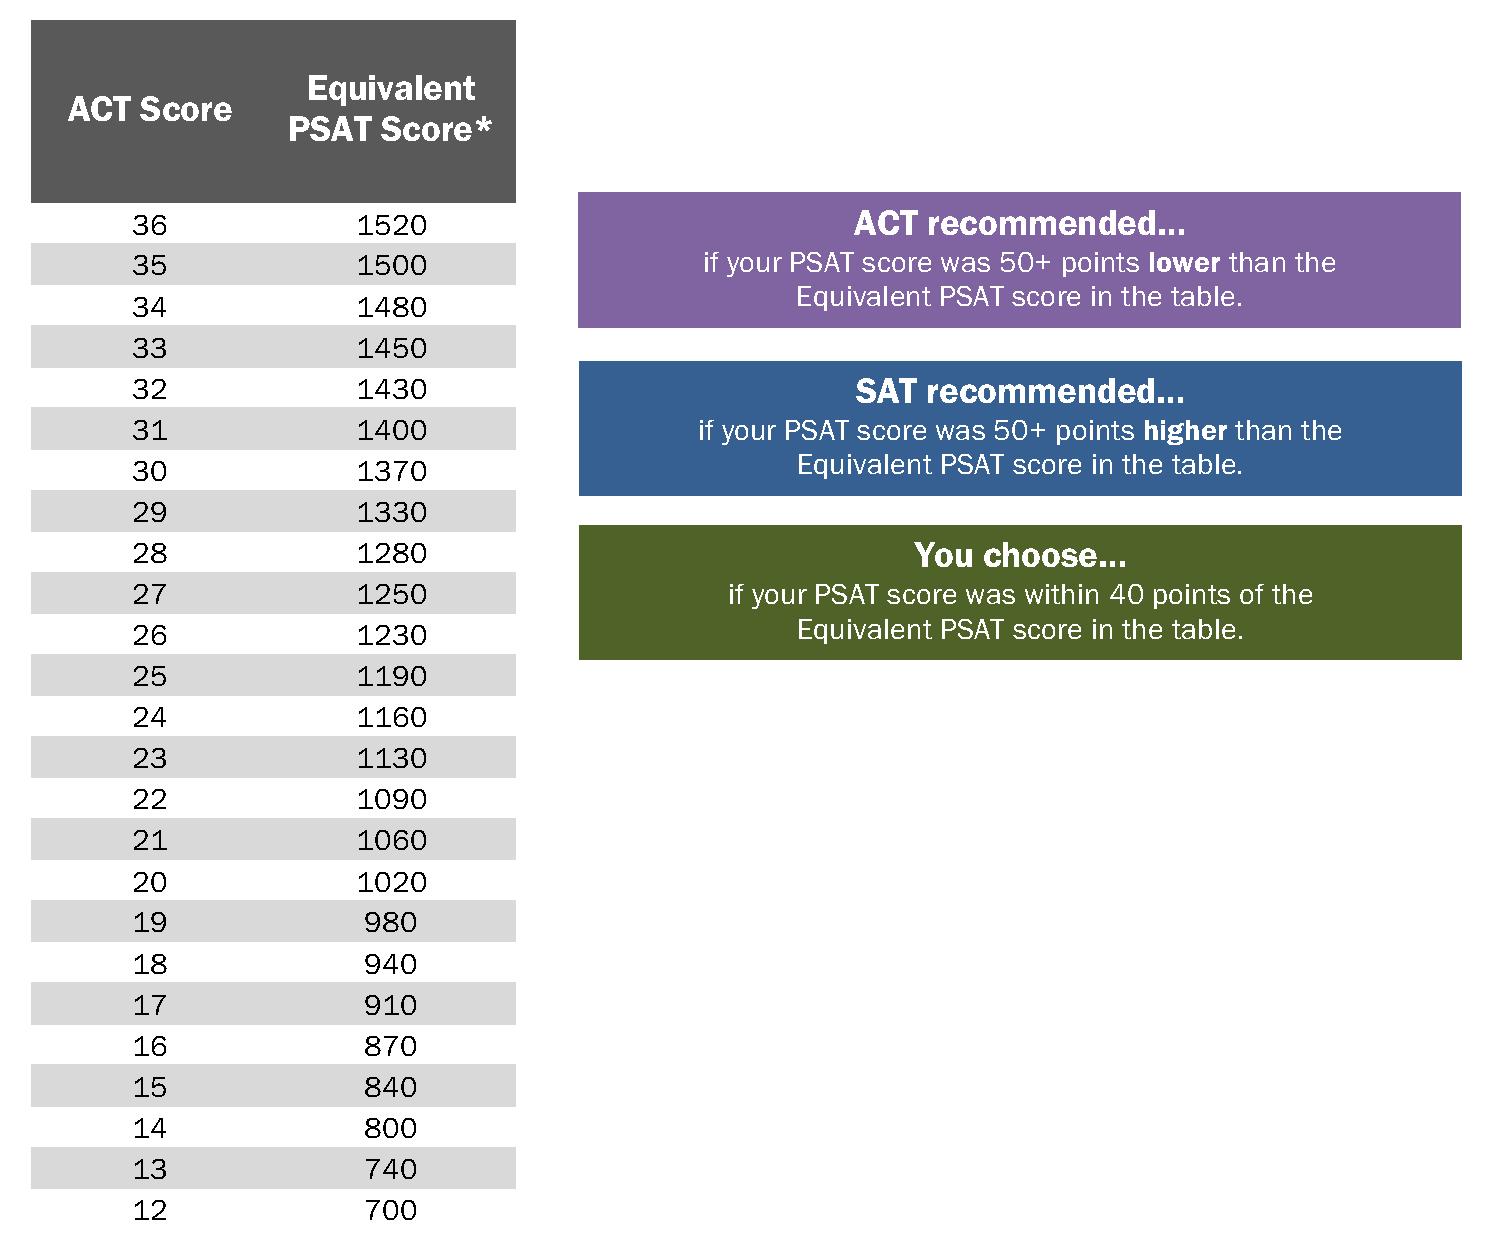 Act and sat conversion chart choice image free any chart examples act sat conversion chart eureka psat raw score conversion chart psat raw score conversion chart image nvjuhfo Choice Image